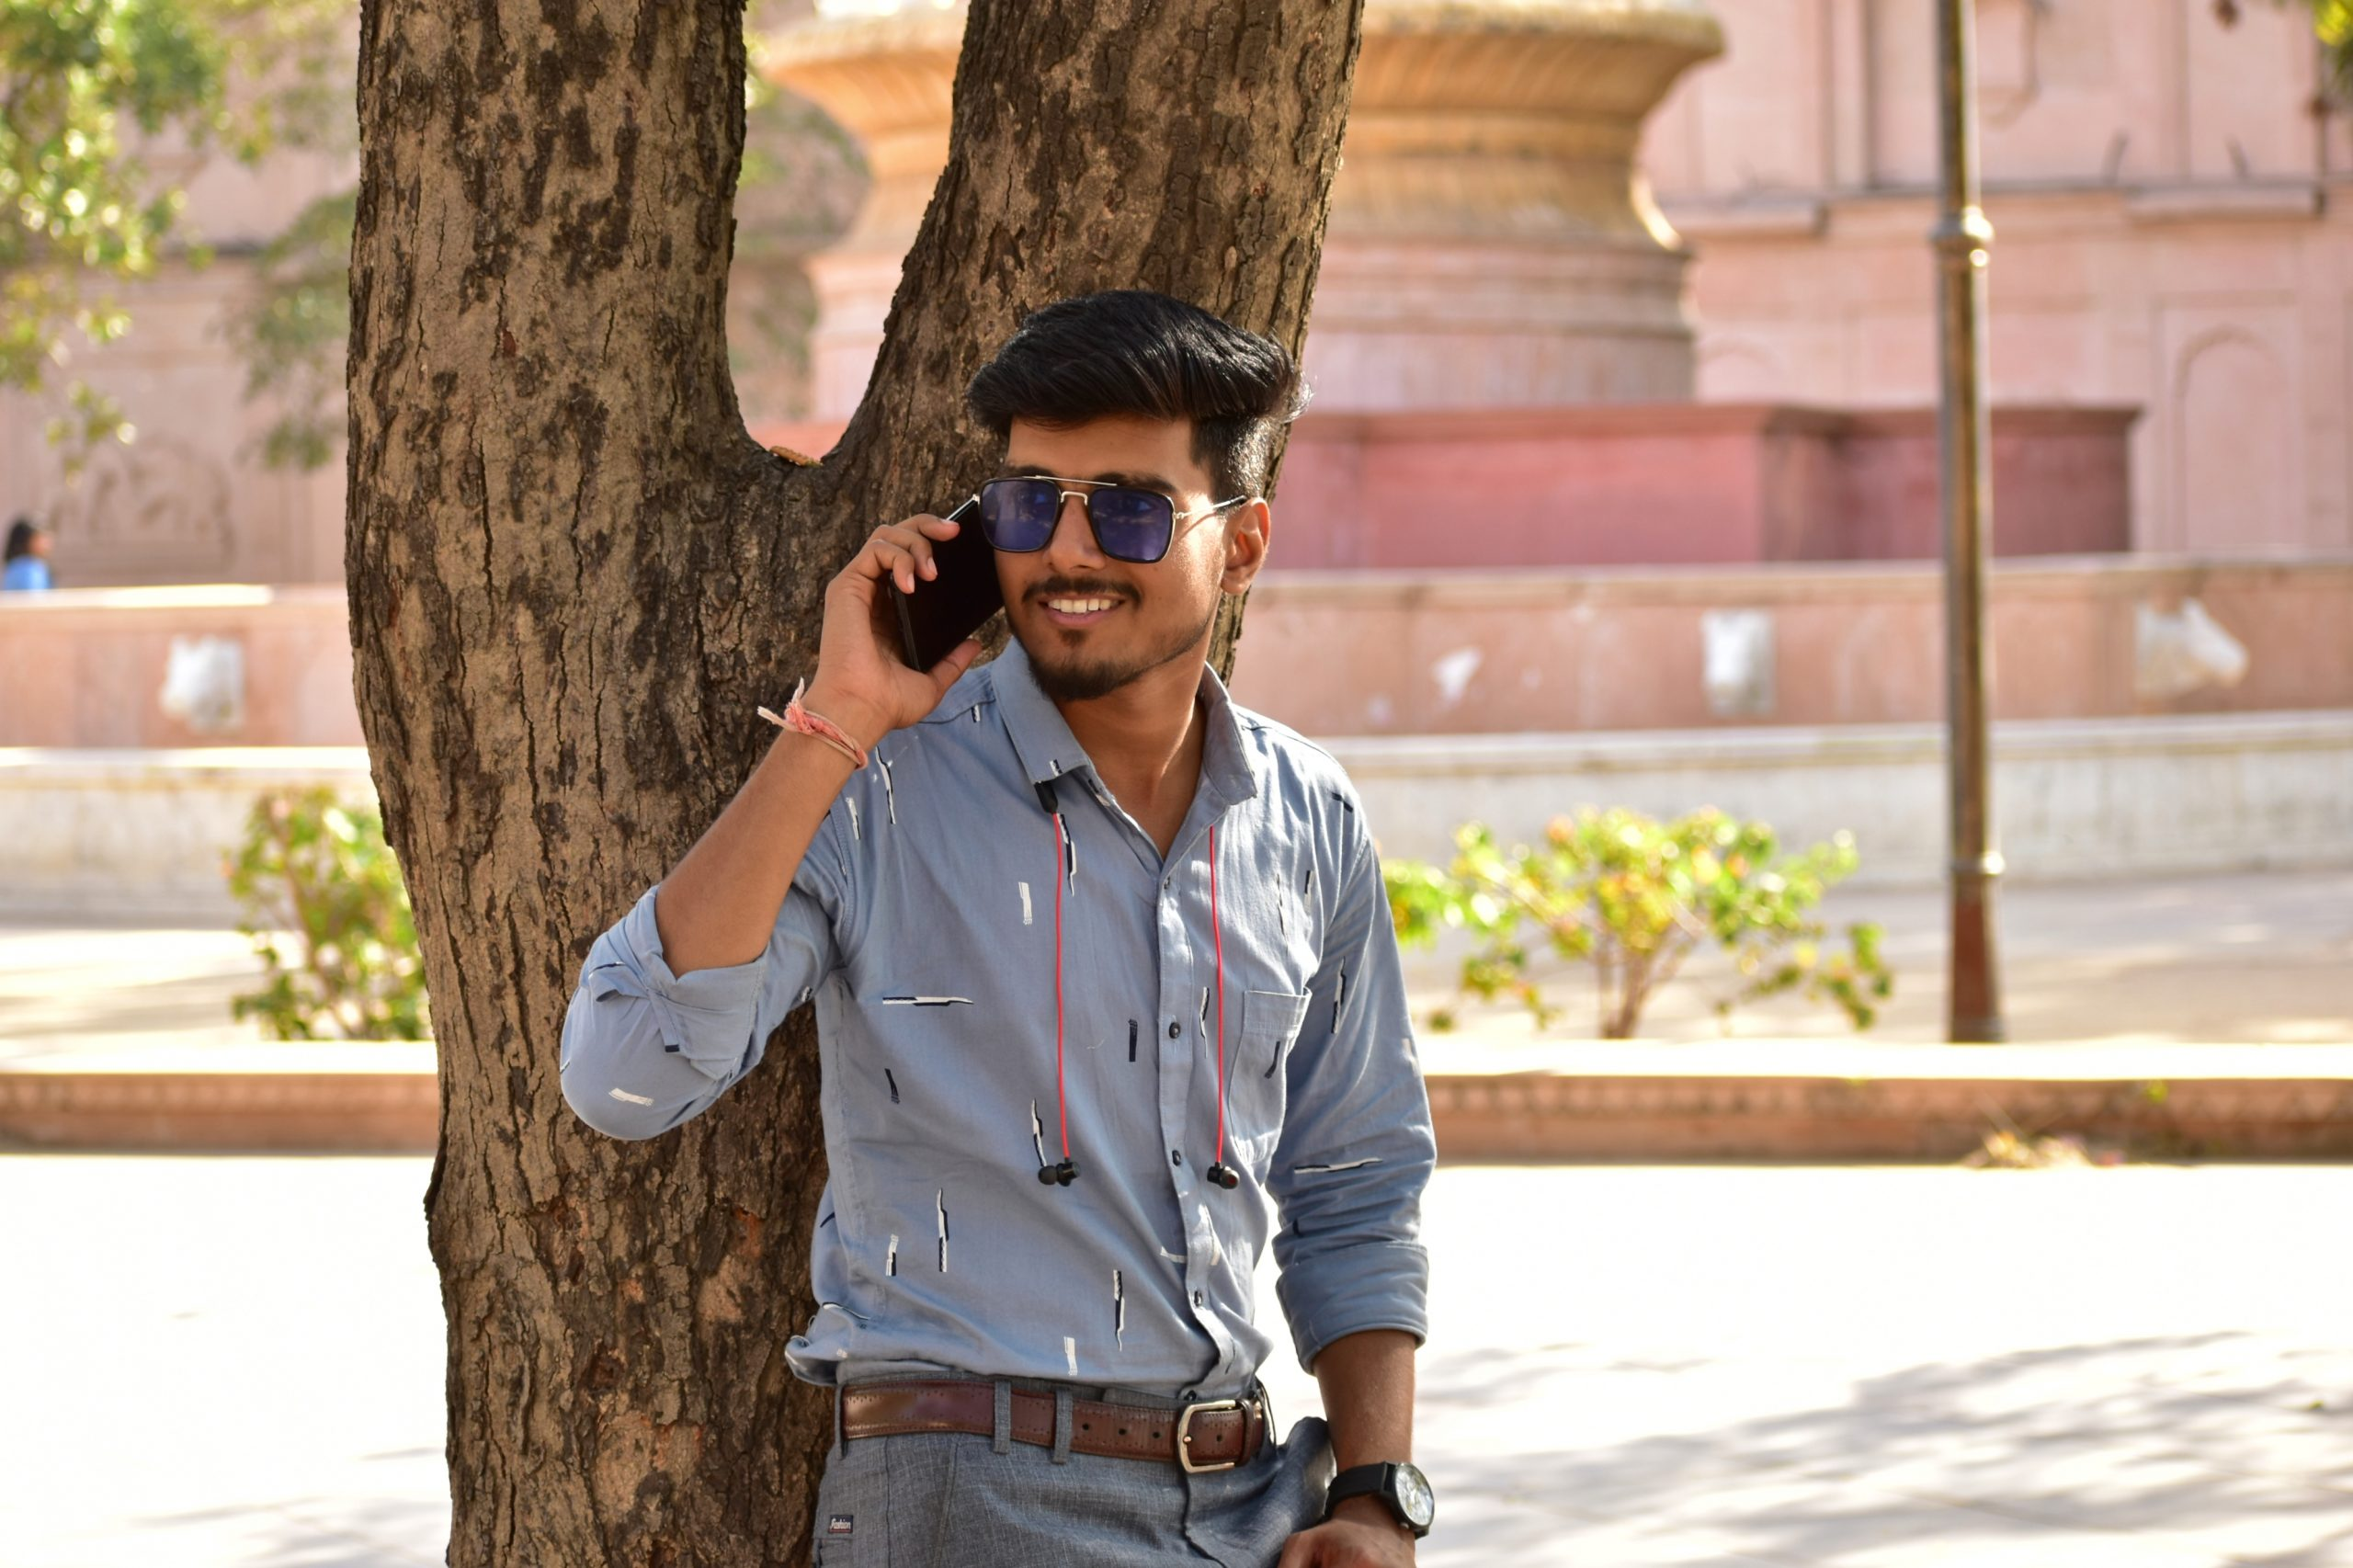 Man talking on phone and posing